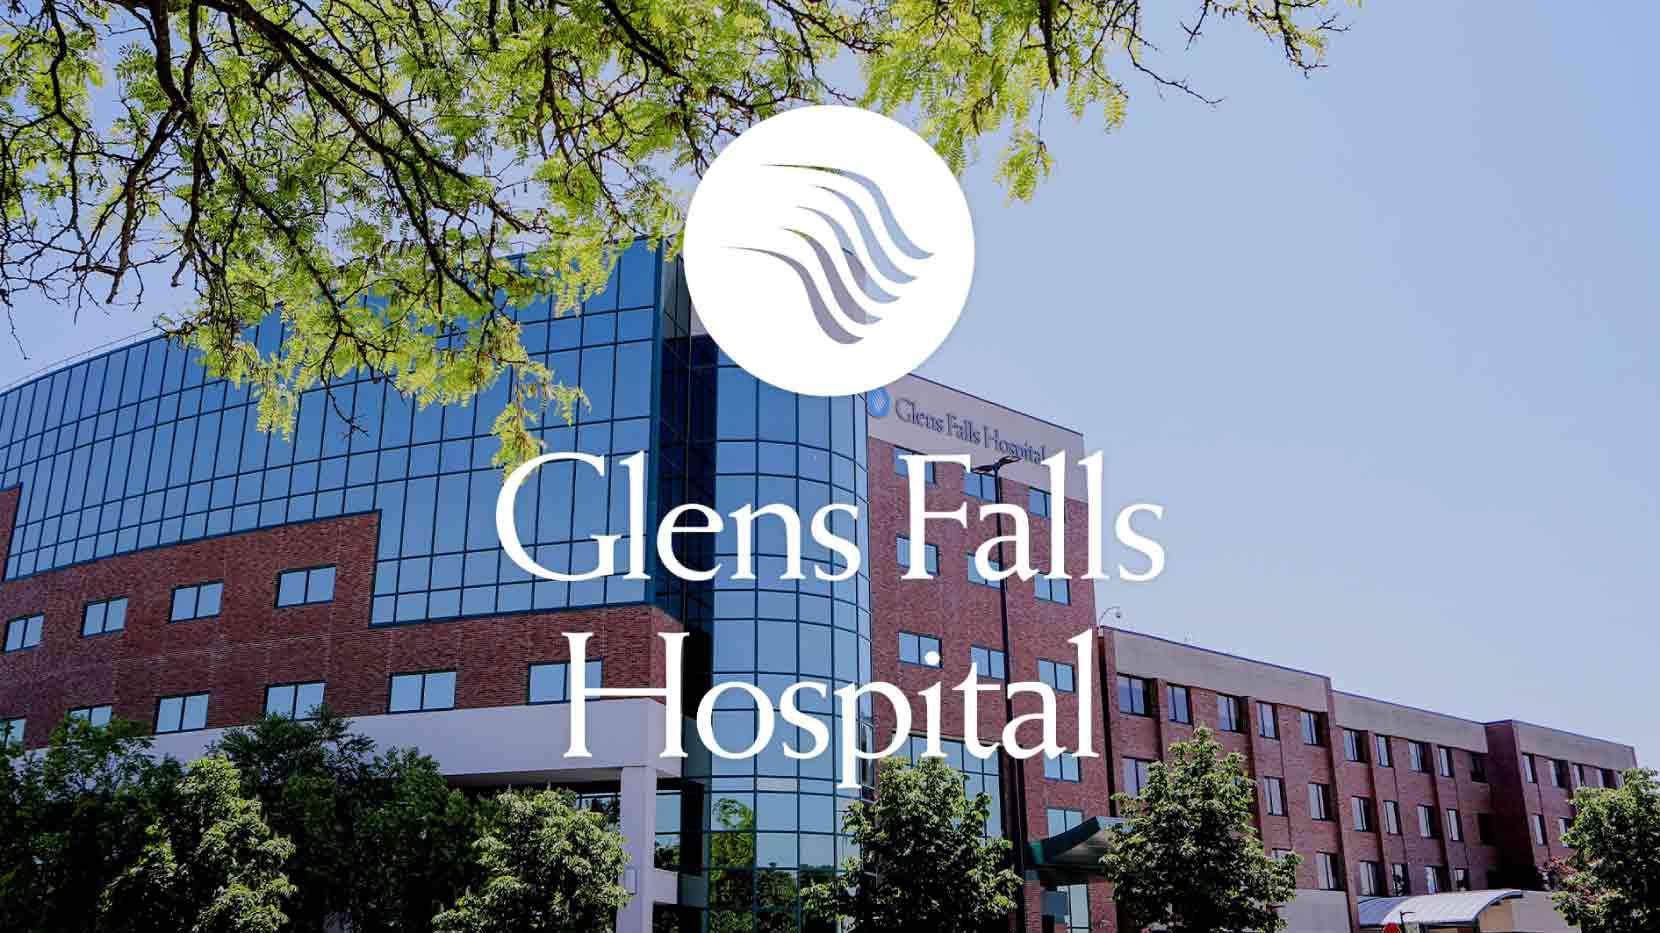 Glens Falls Hospital_hospital exterior background